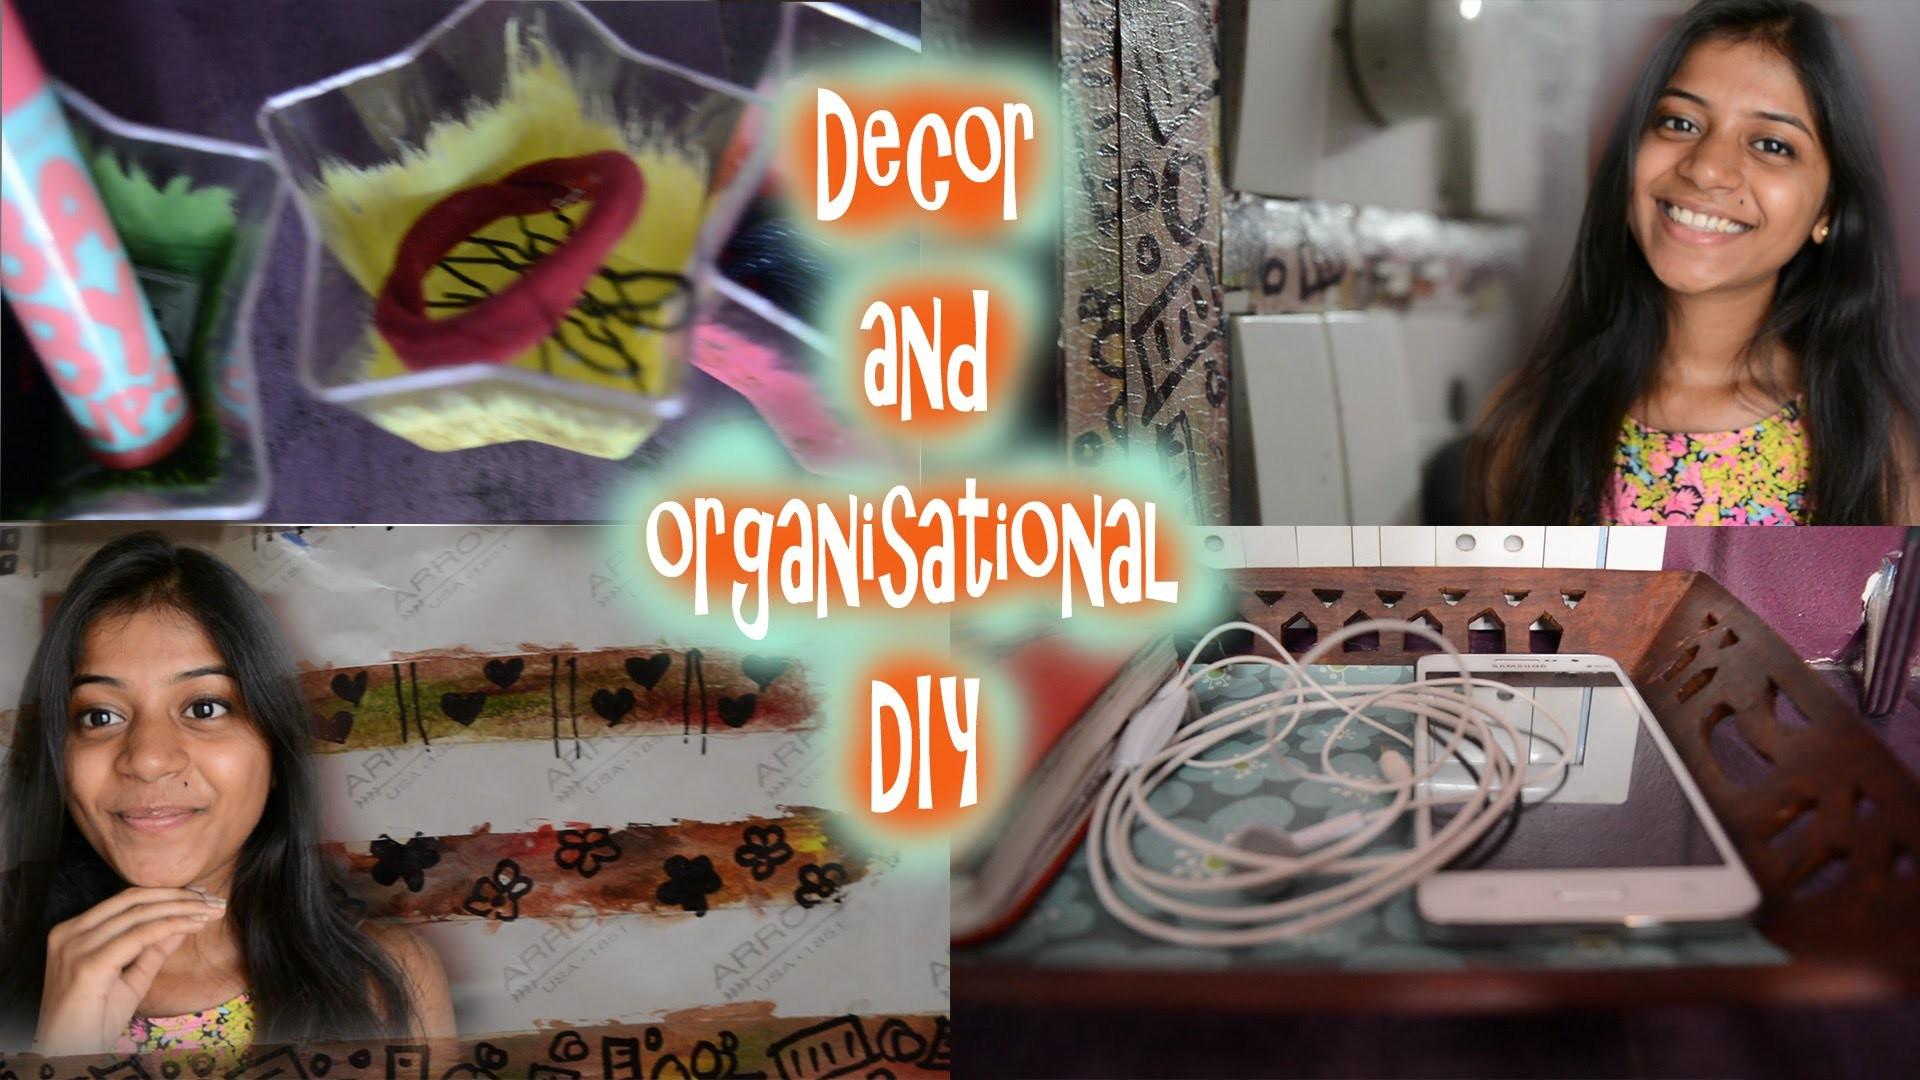 Decor and organizational DIY | Neesome DIY